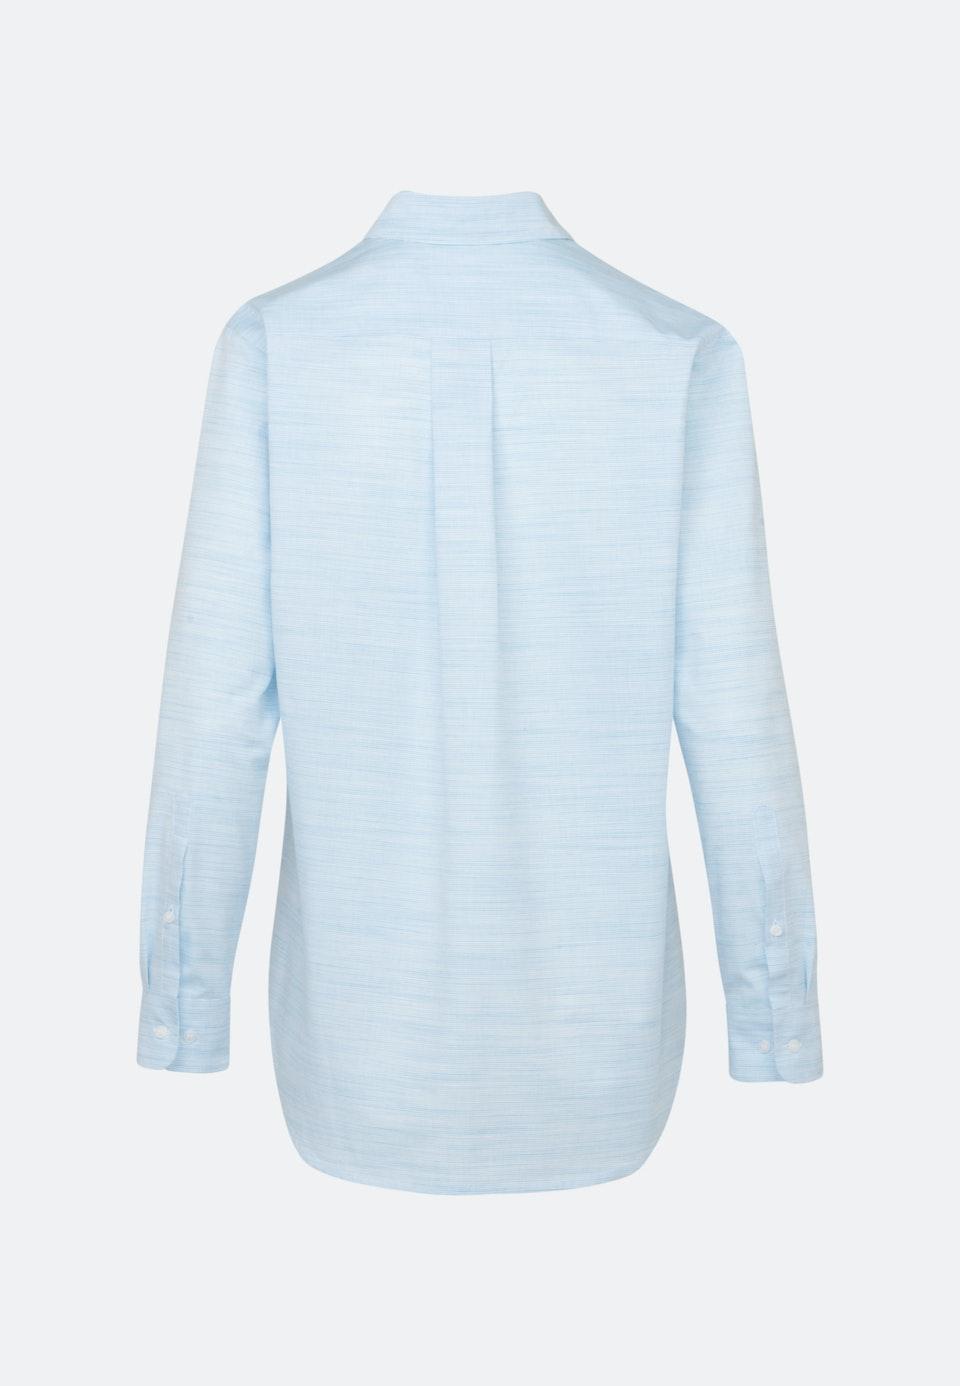 Popeline Shirt Blouse made of 100% Cotton in Light blue |  Seidensticker Onlineshop